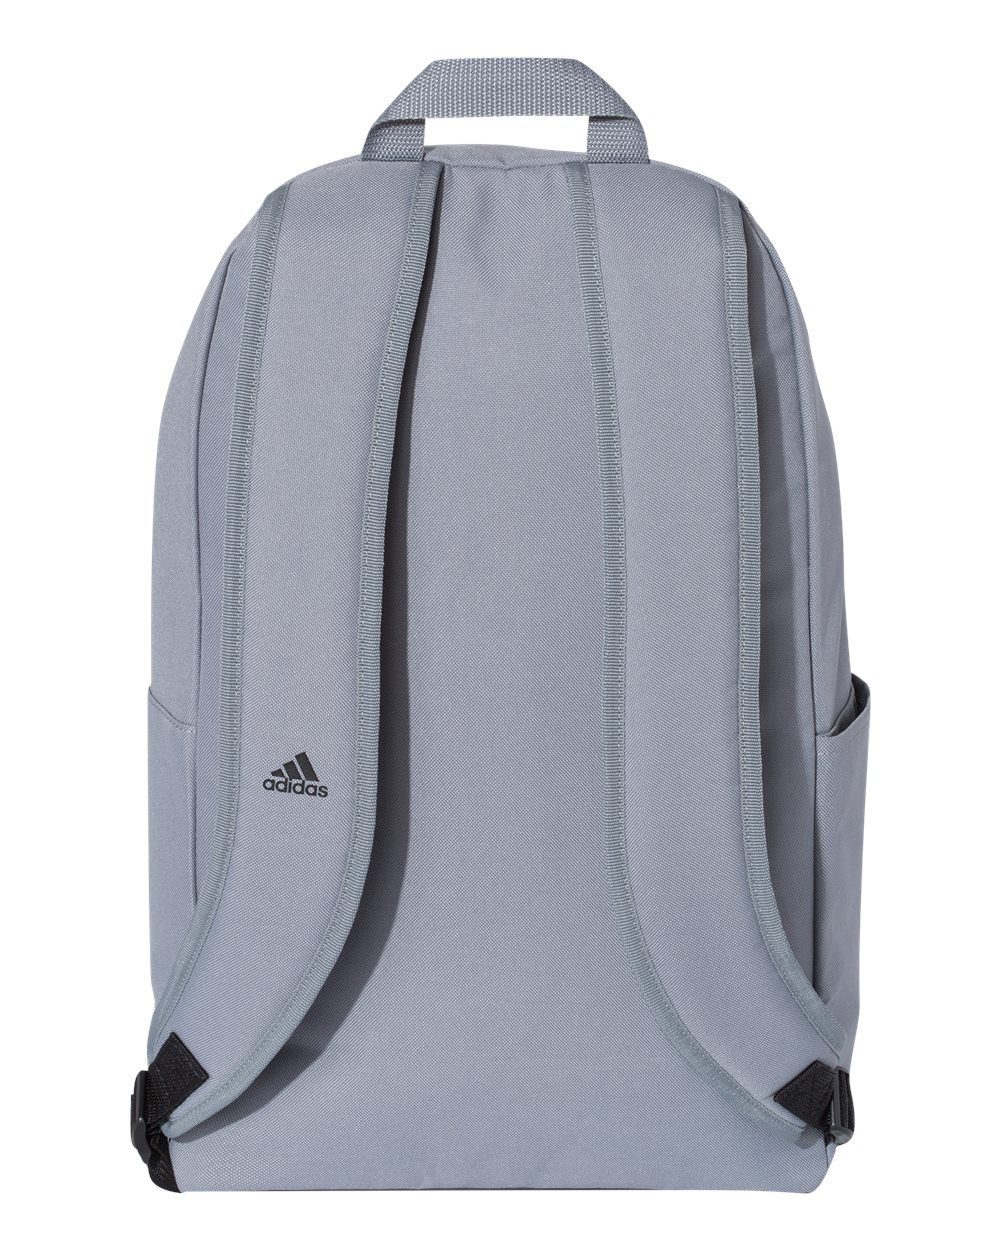 Adidas-Laptop-School-bookbag-18L-3-Stripes-Small-Backpack-11x18x5-5-A301 thumbnail 13